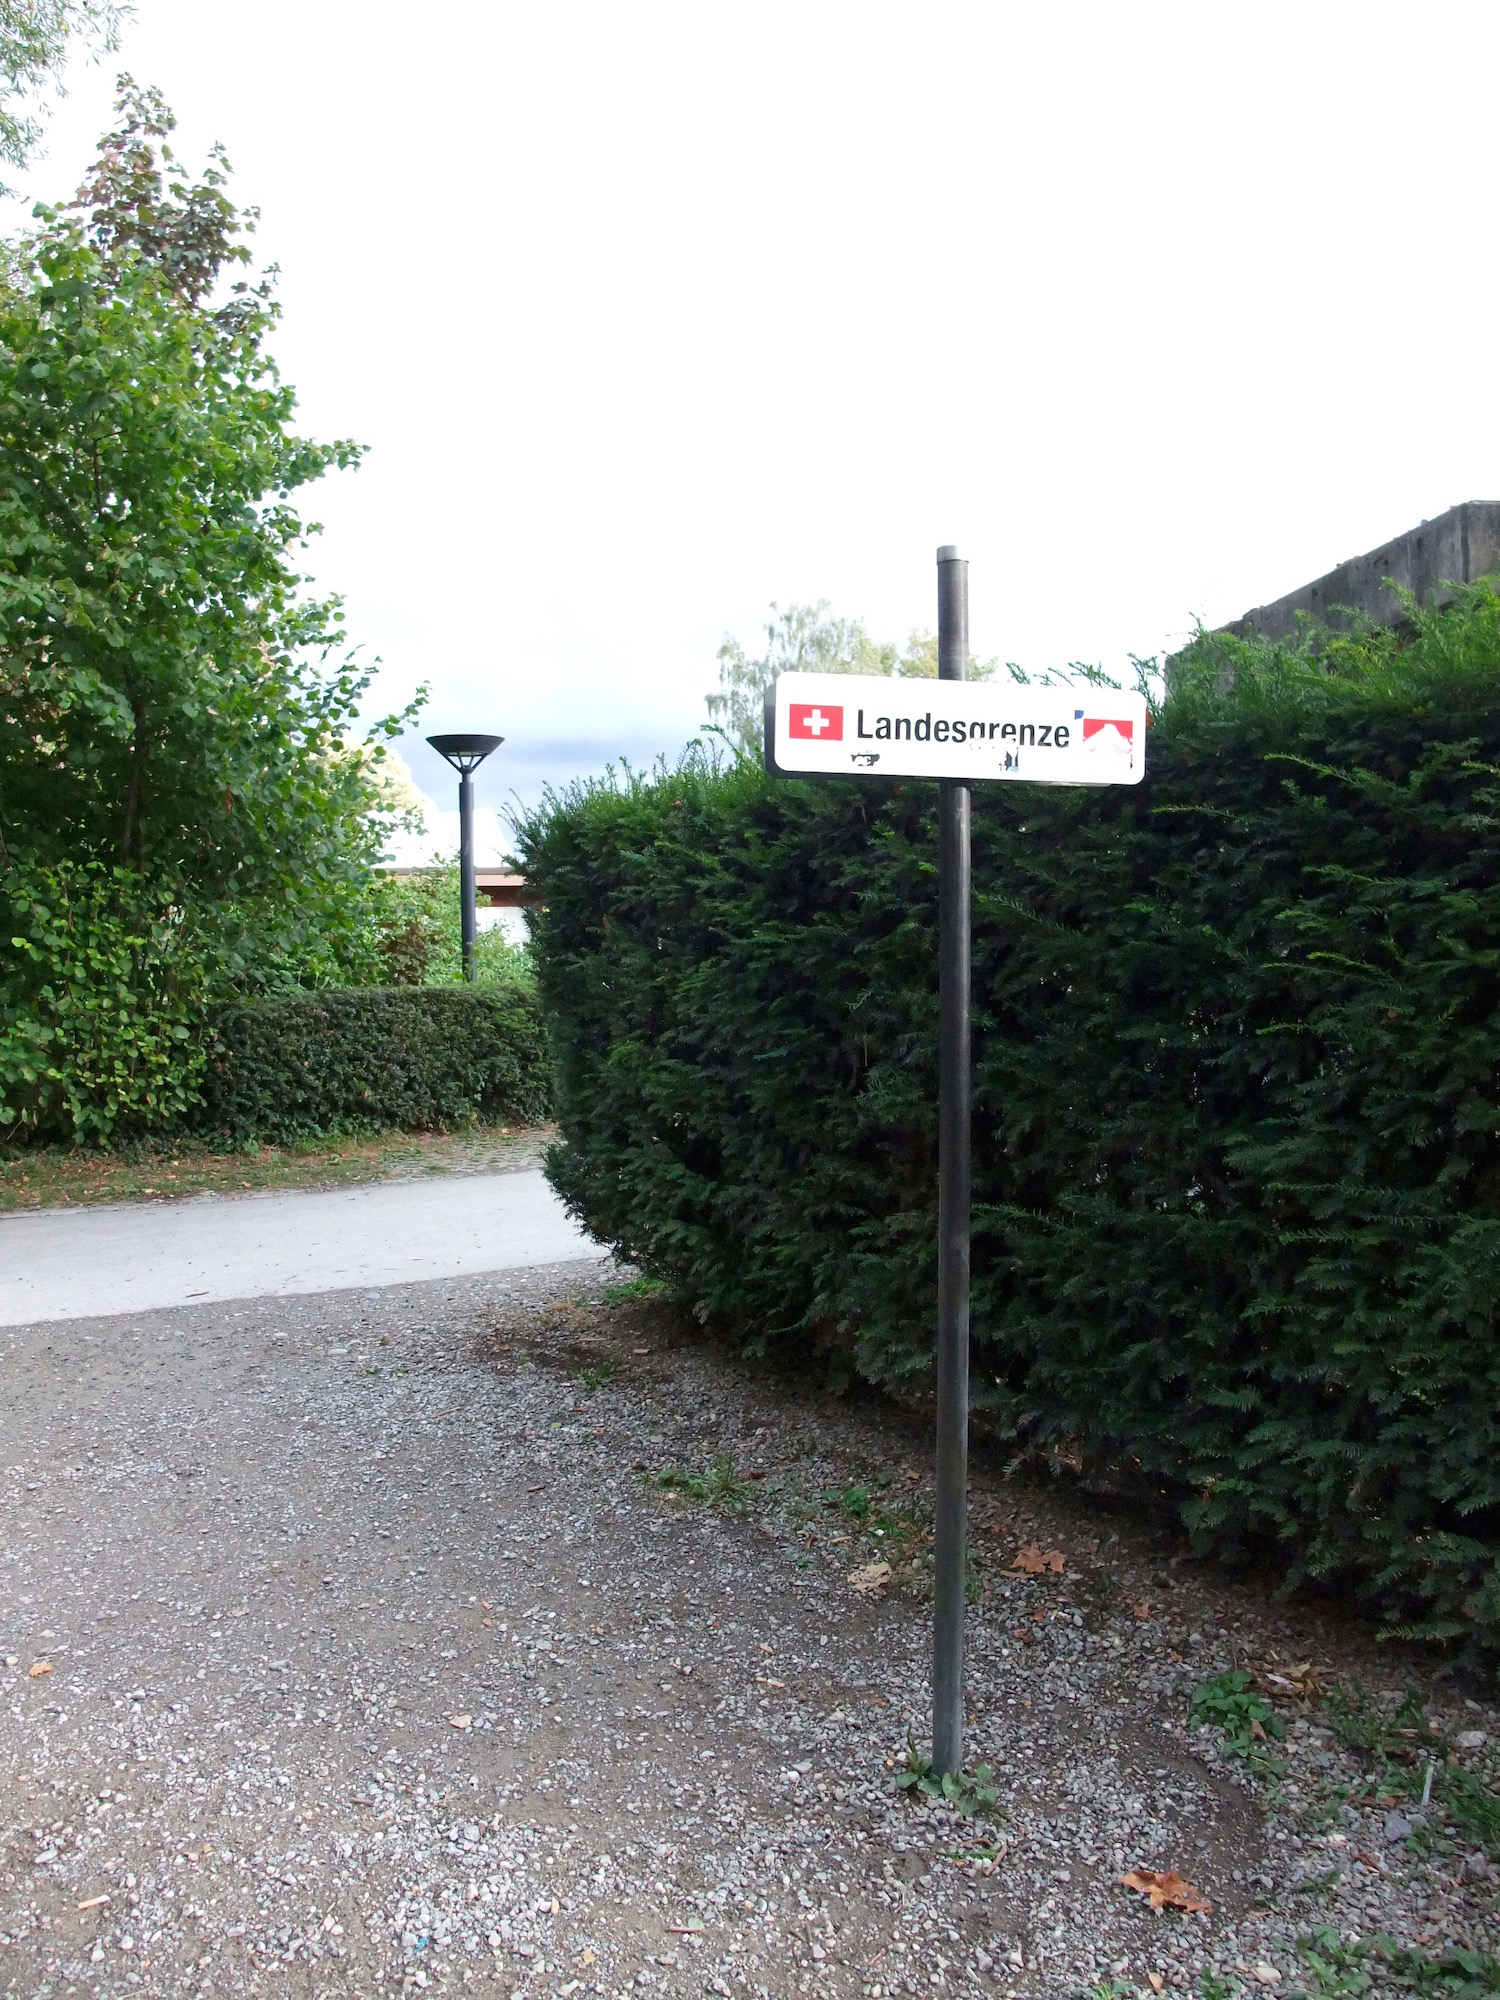 Crossing the border to Switzerland